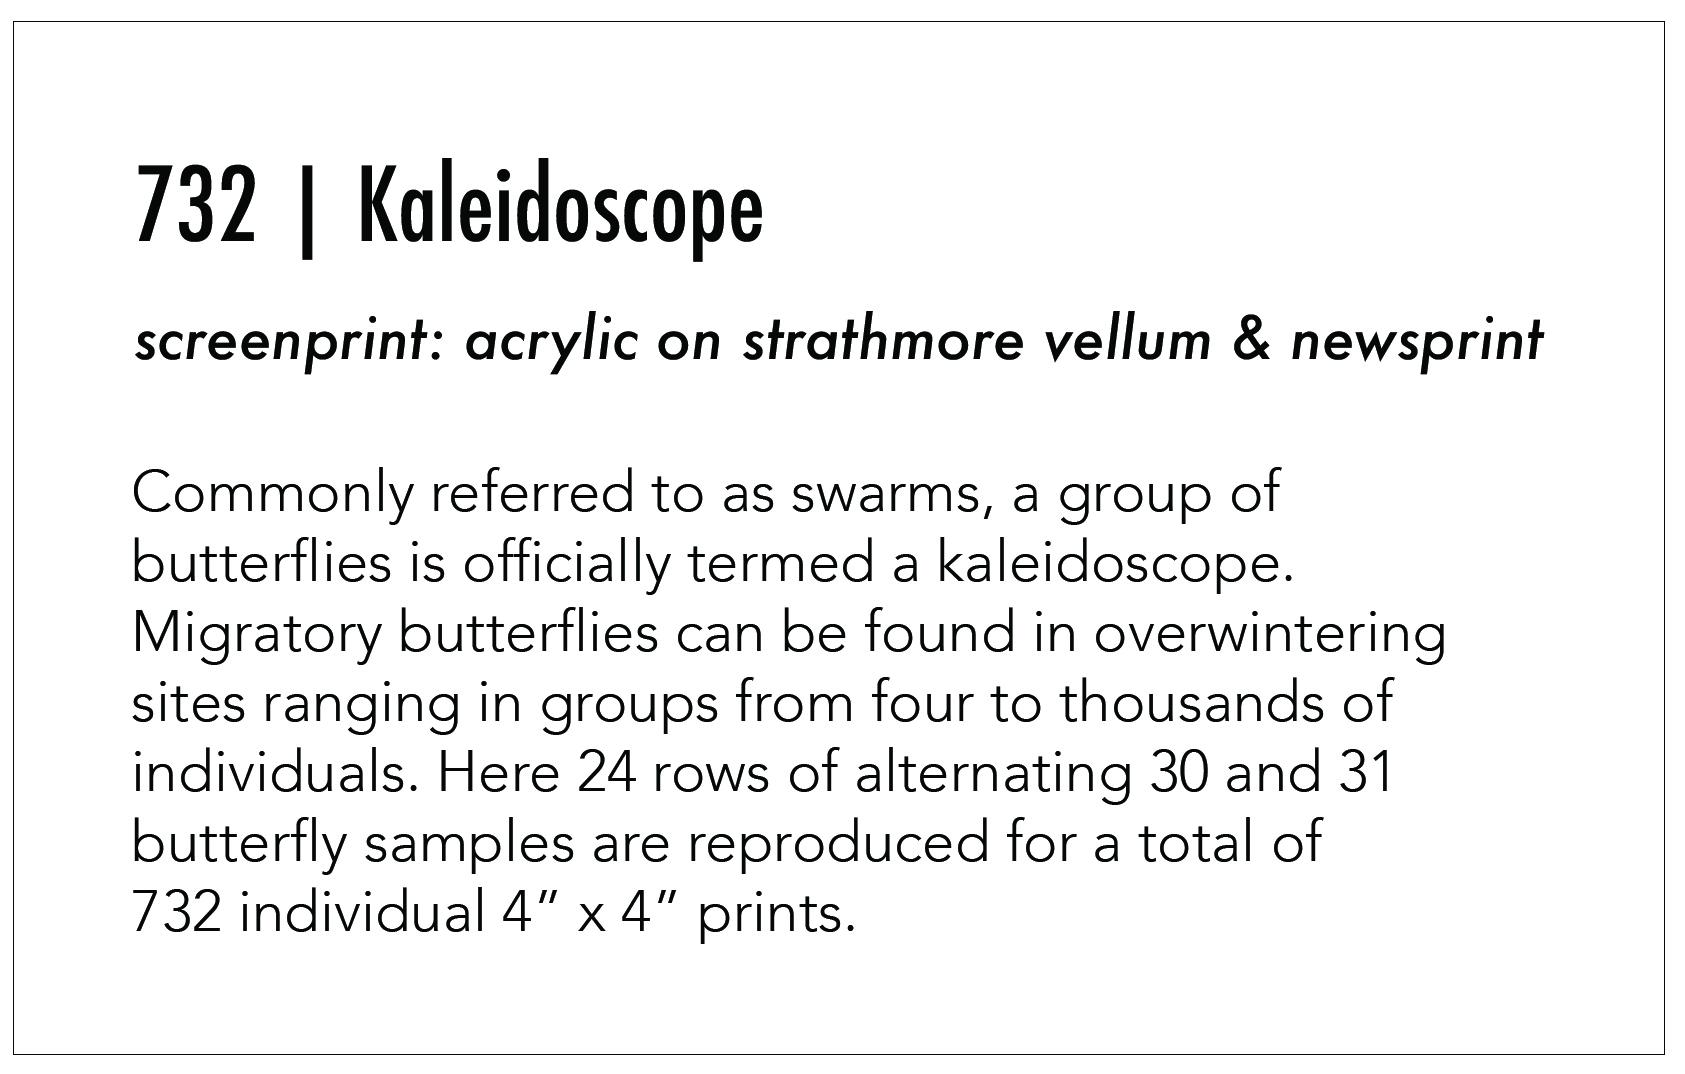 Kaleidoscope_About.jpg